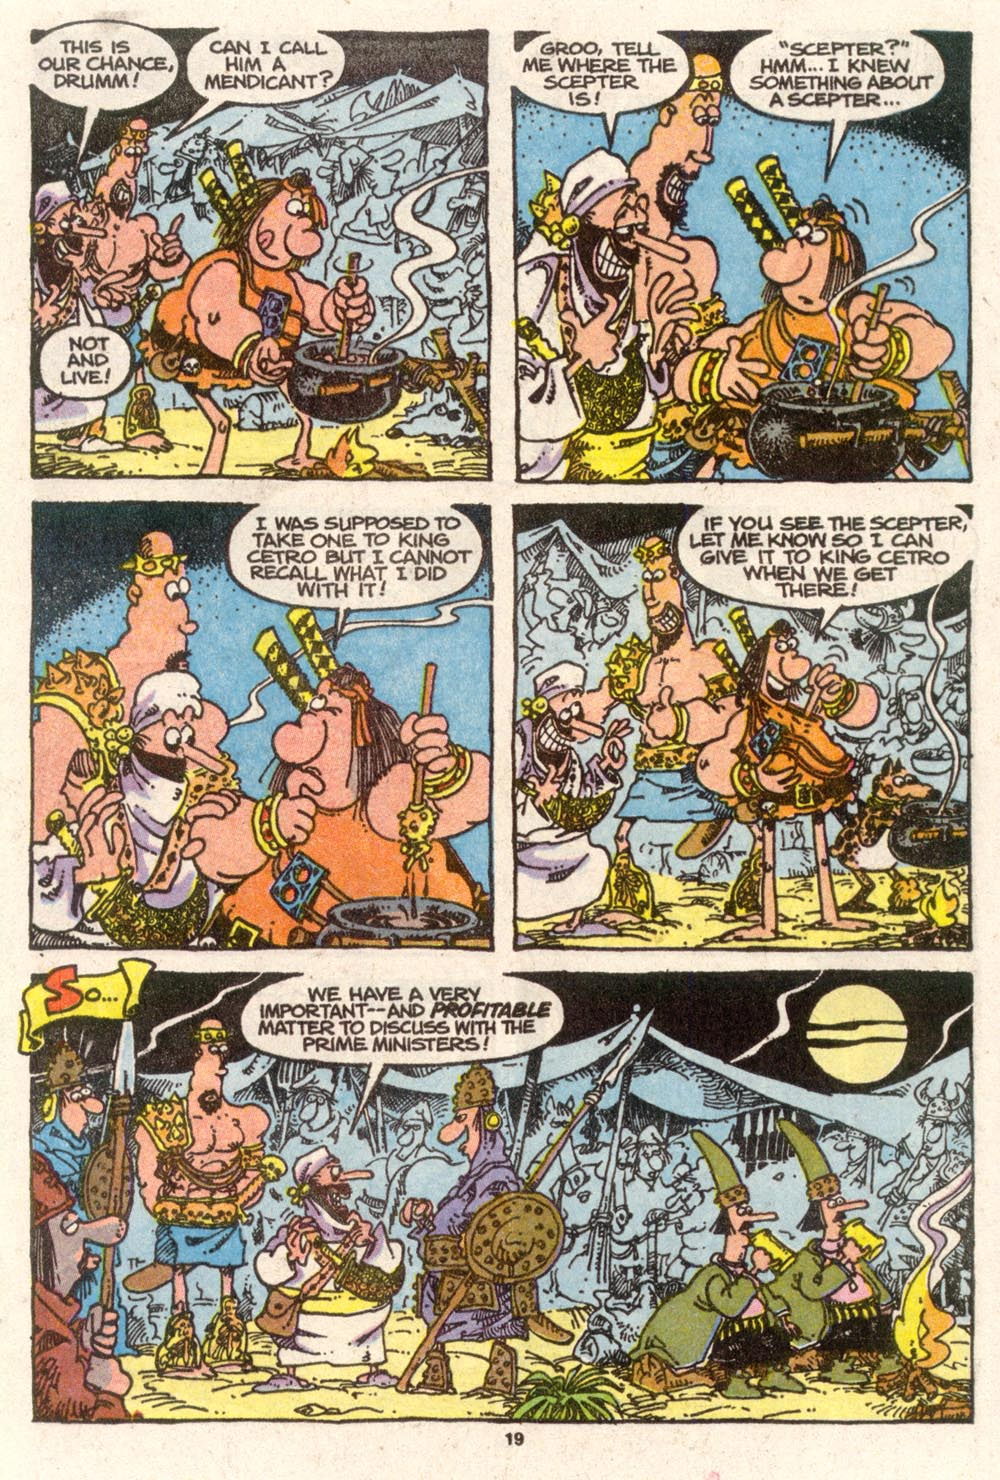 Read online Sergio Aragonés Groo the Wanderer comic -  Issue #74 - 15